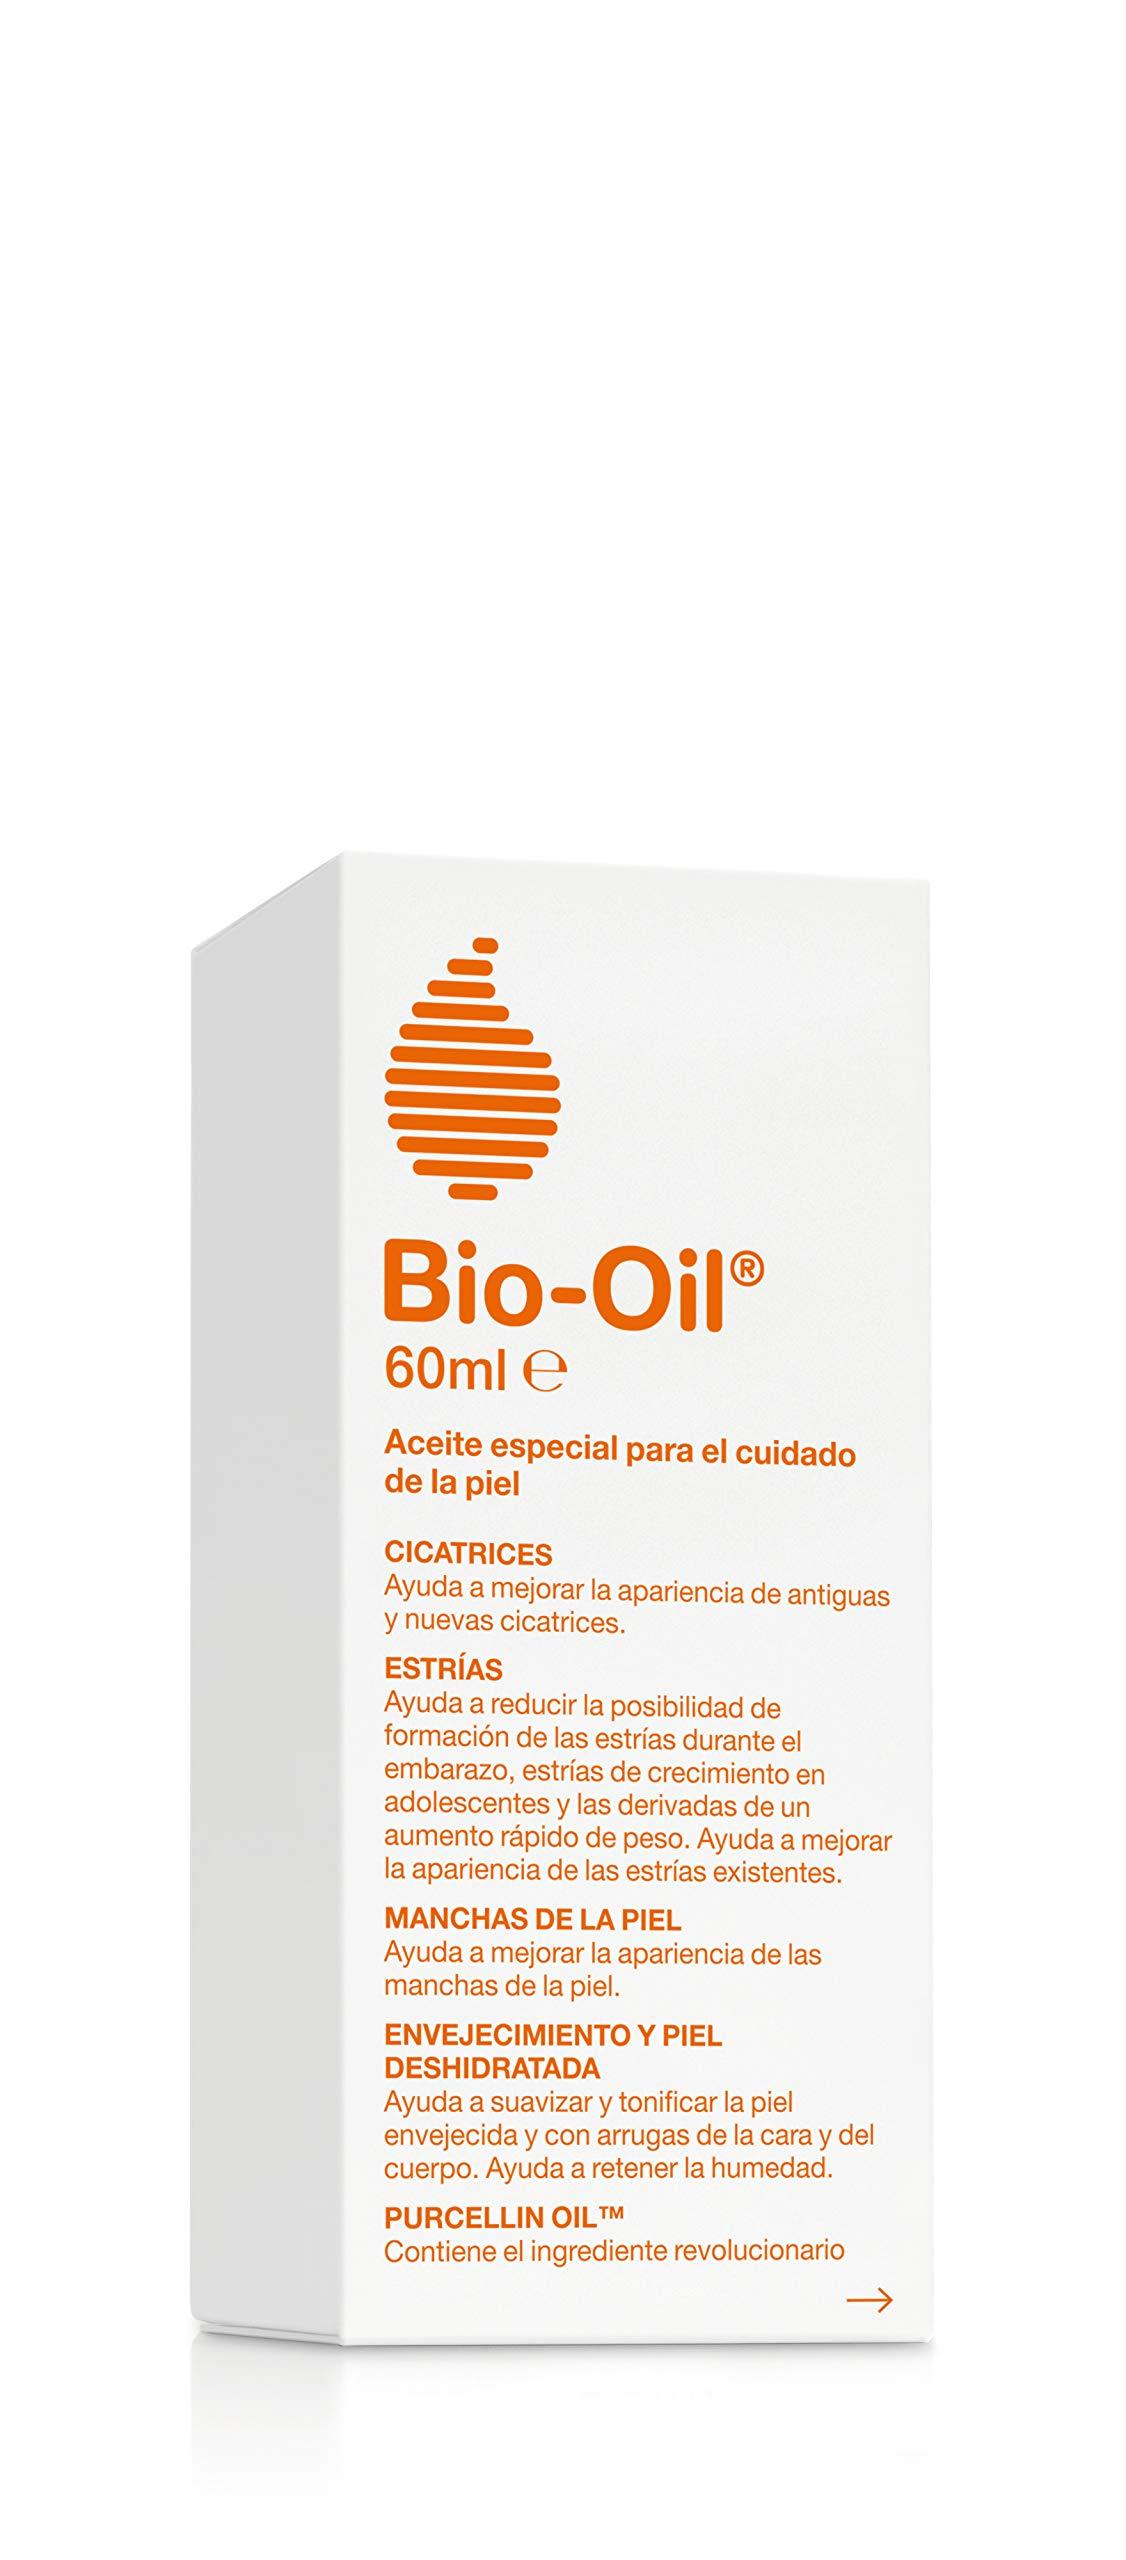 Bio-Oil, Aceite corporal (piel seca) - 60 ml. product image